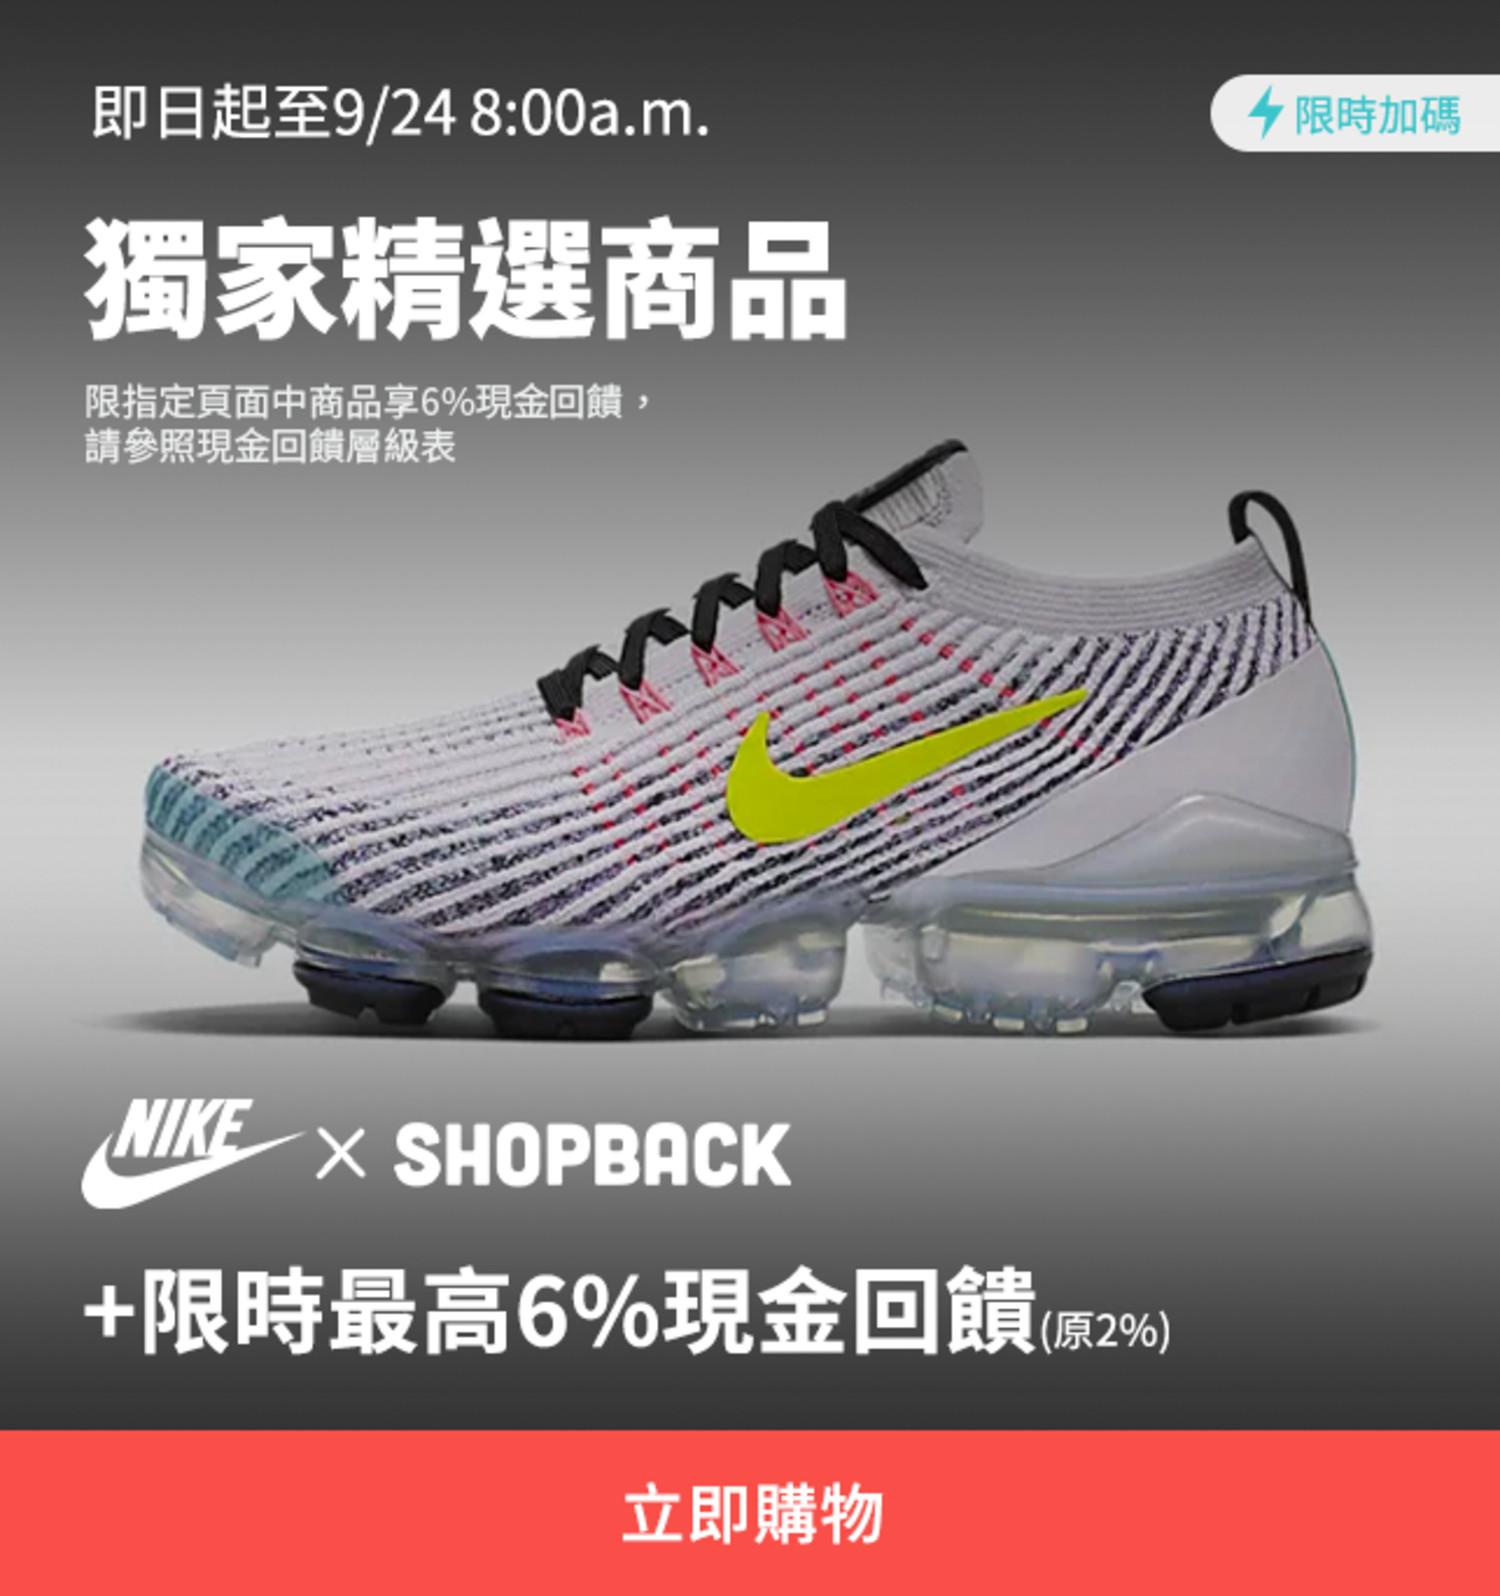 Nike 精選加碼-9/24 8:00a.m.